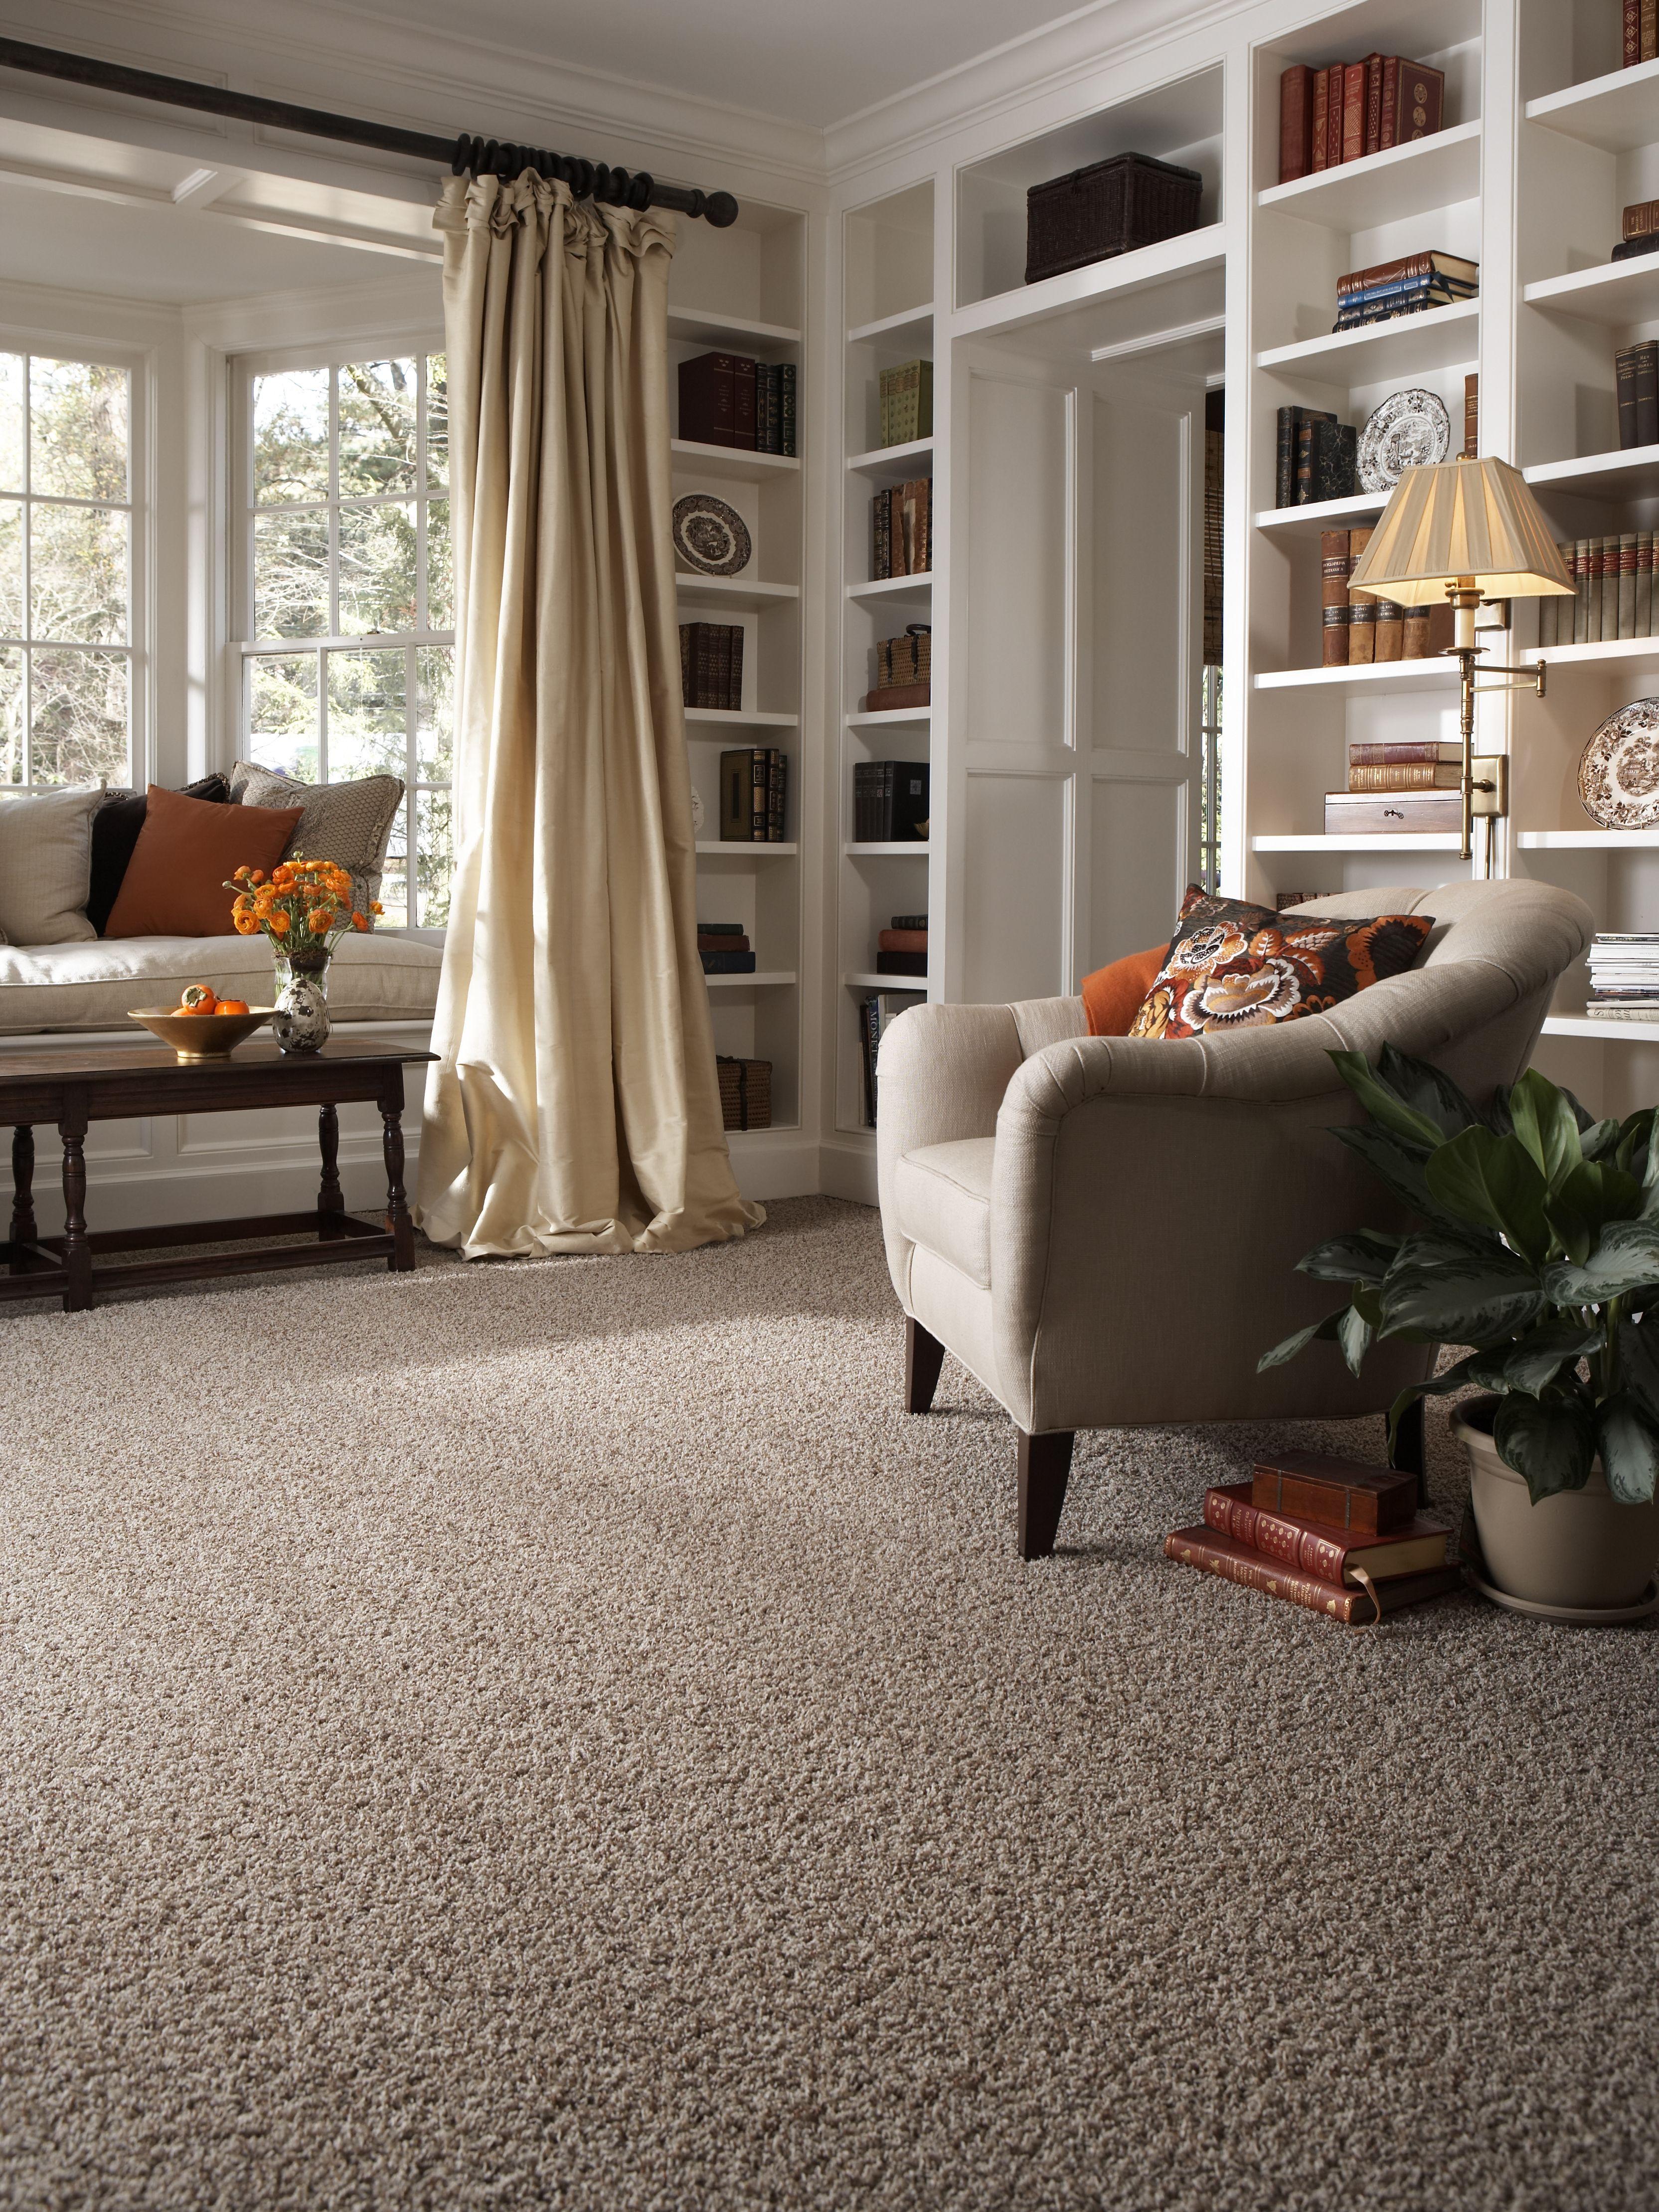 Carpet Flooring Design Image Gallery Coles Fine Flooring Brown Carpet Living Room Beige Carpet Living Room Living Room Carpet #white #carpet #for #living #room